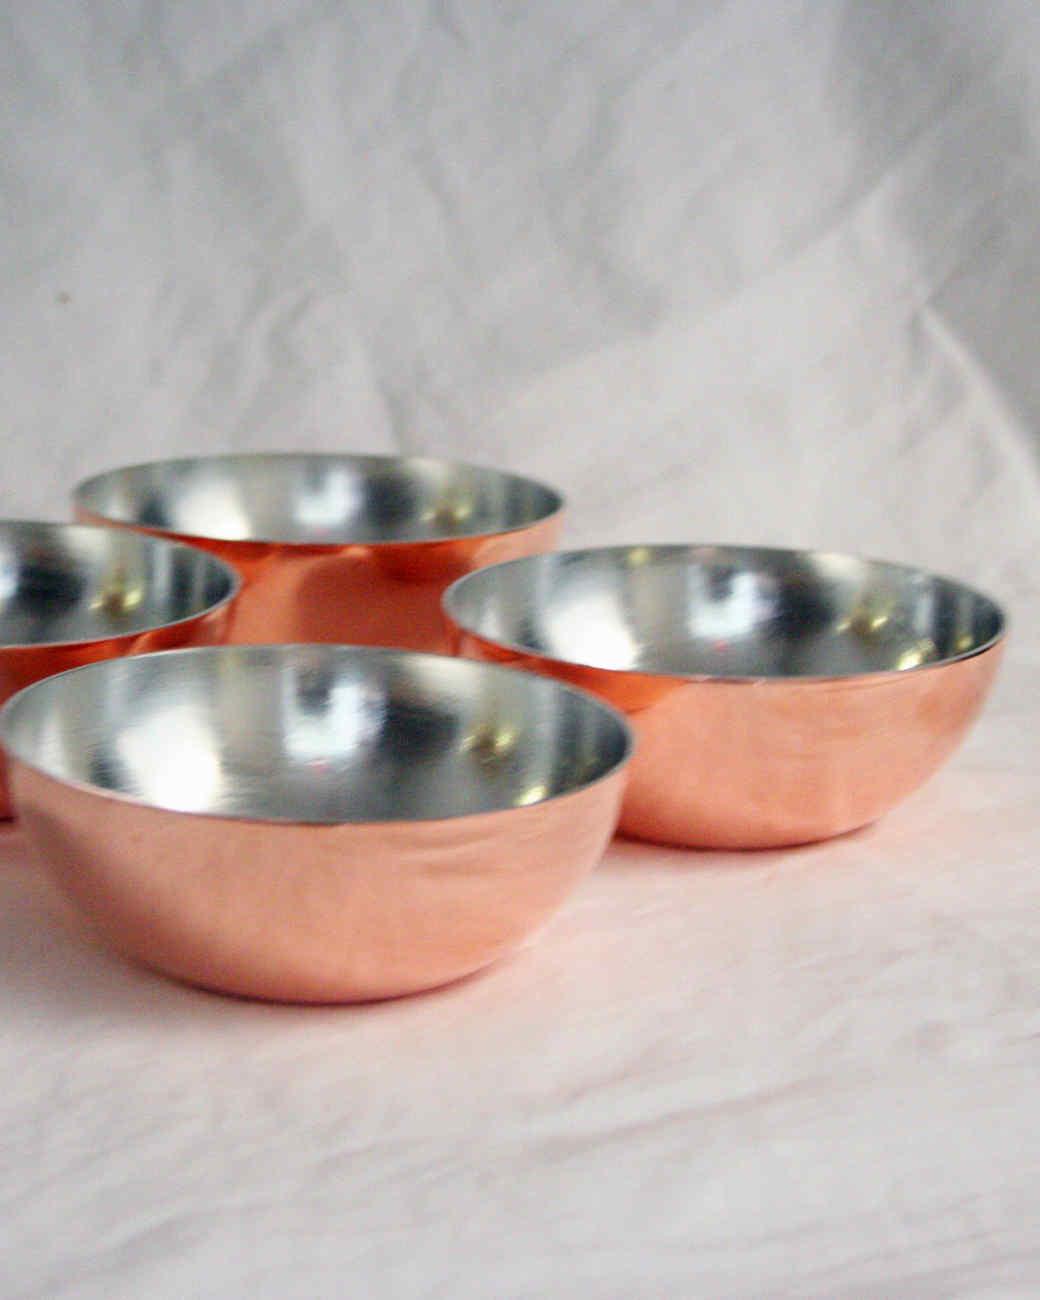 duparquet-copper-cookware-serving-bowl-1014.jpg